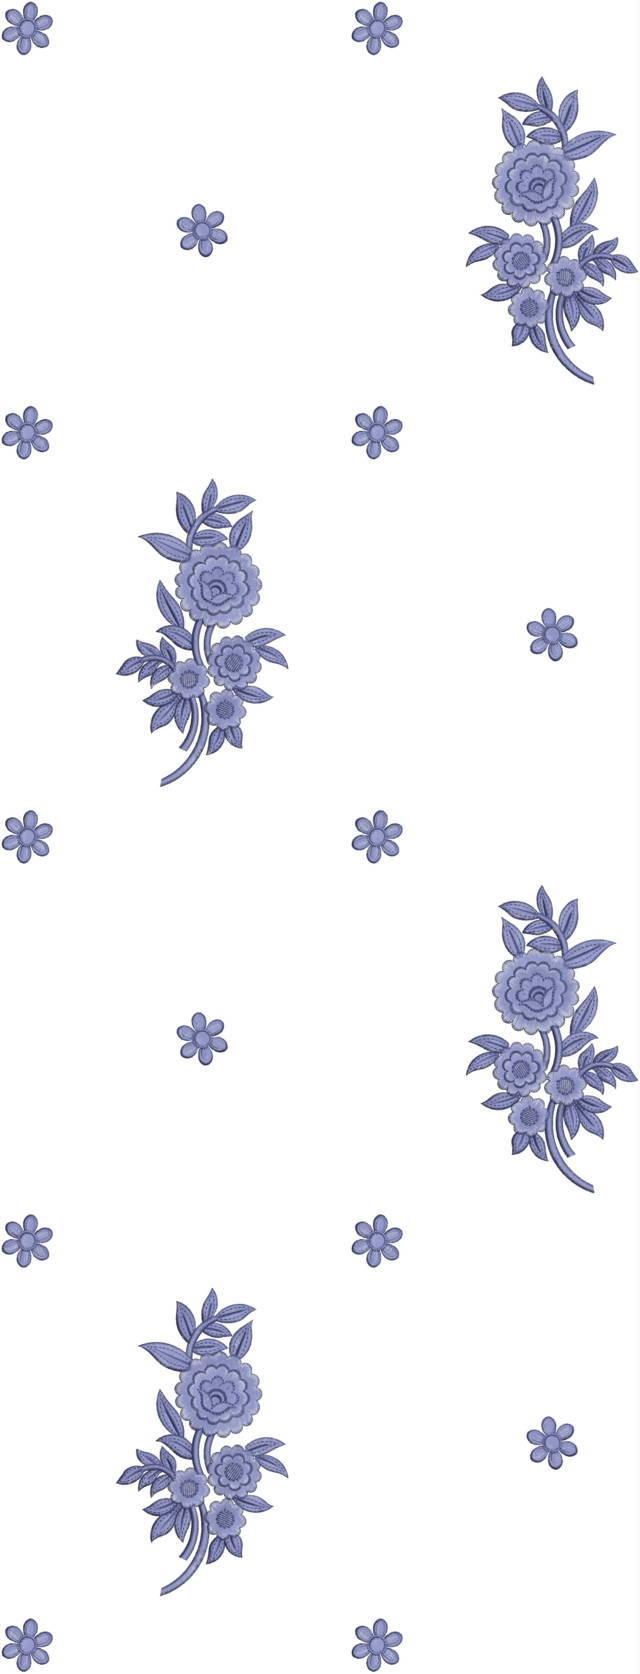 Duptta embroidery  design